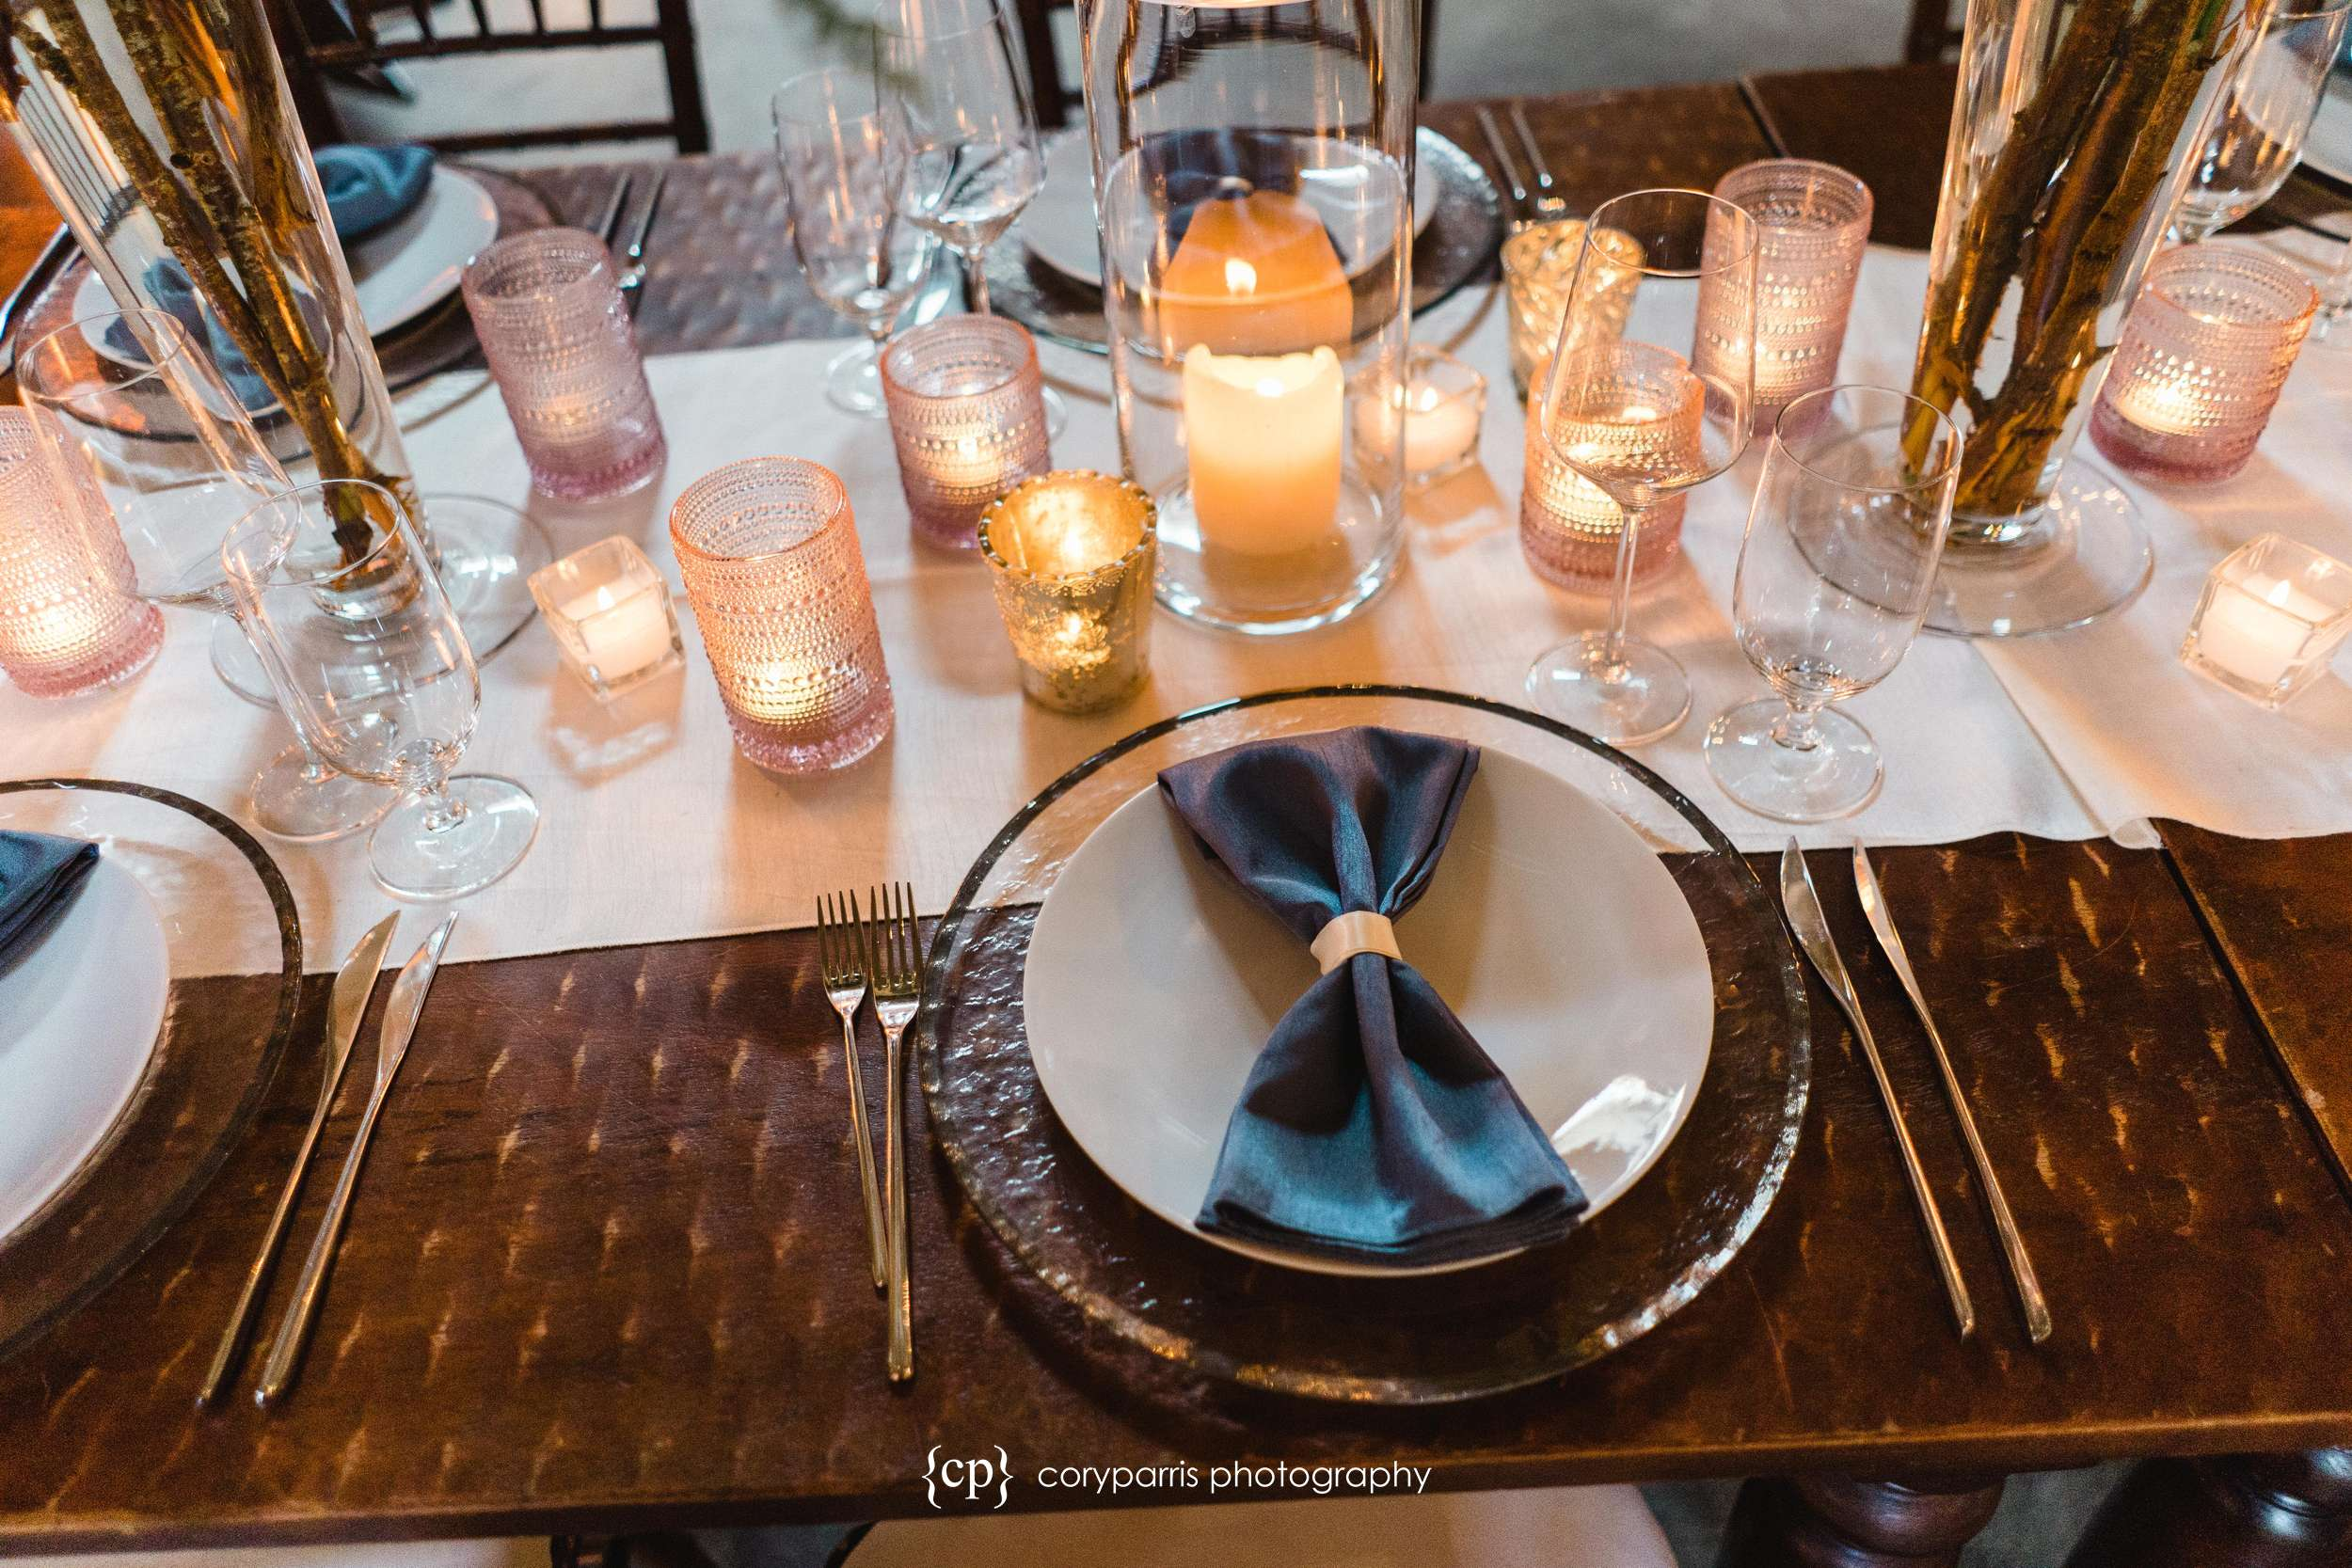 009-the-foundry-wedding-venue-seattle.jpg